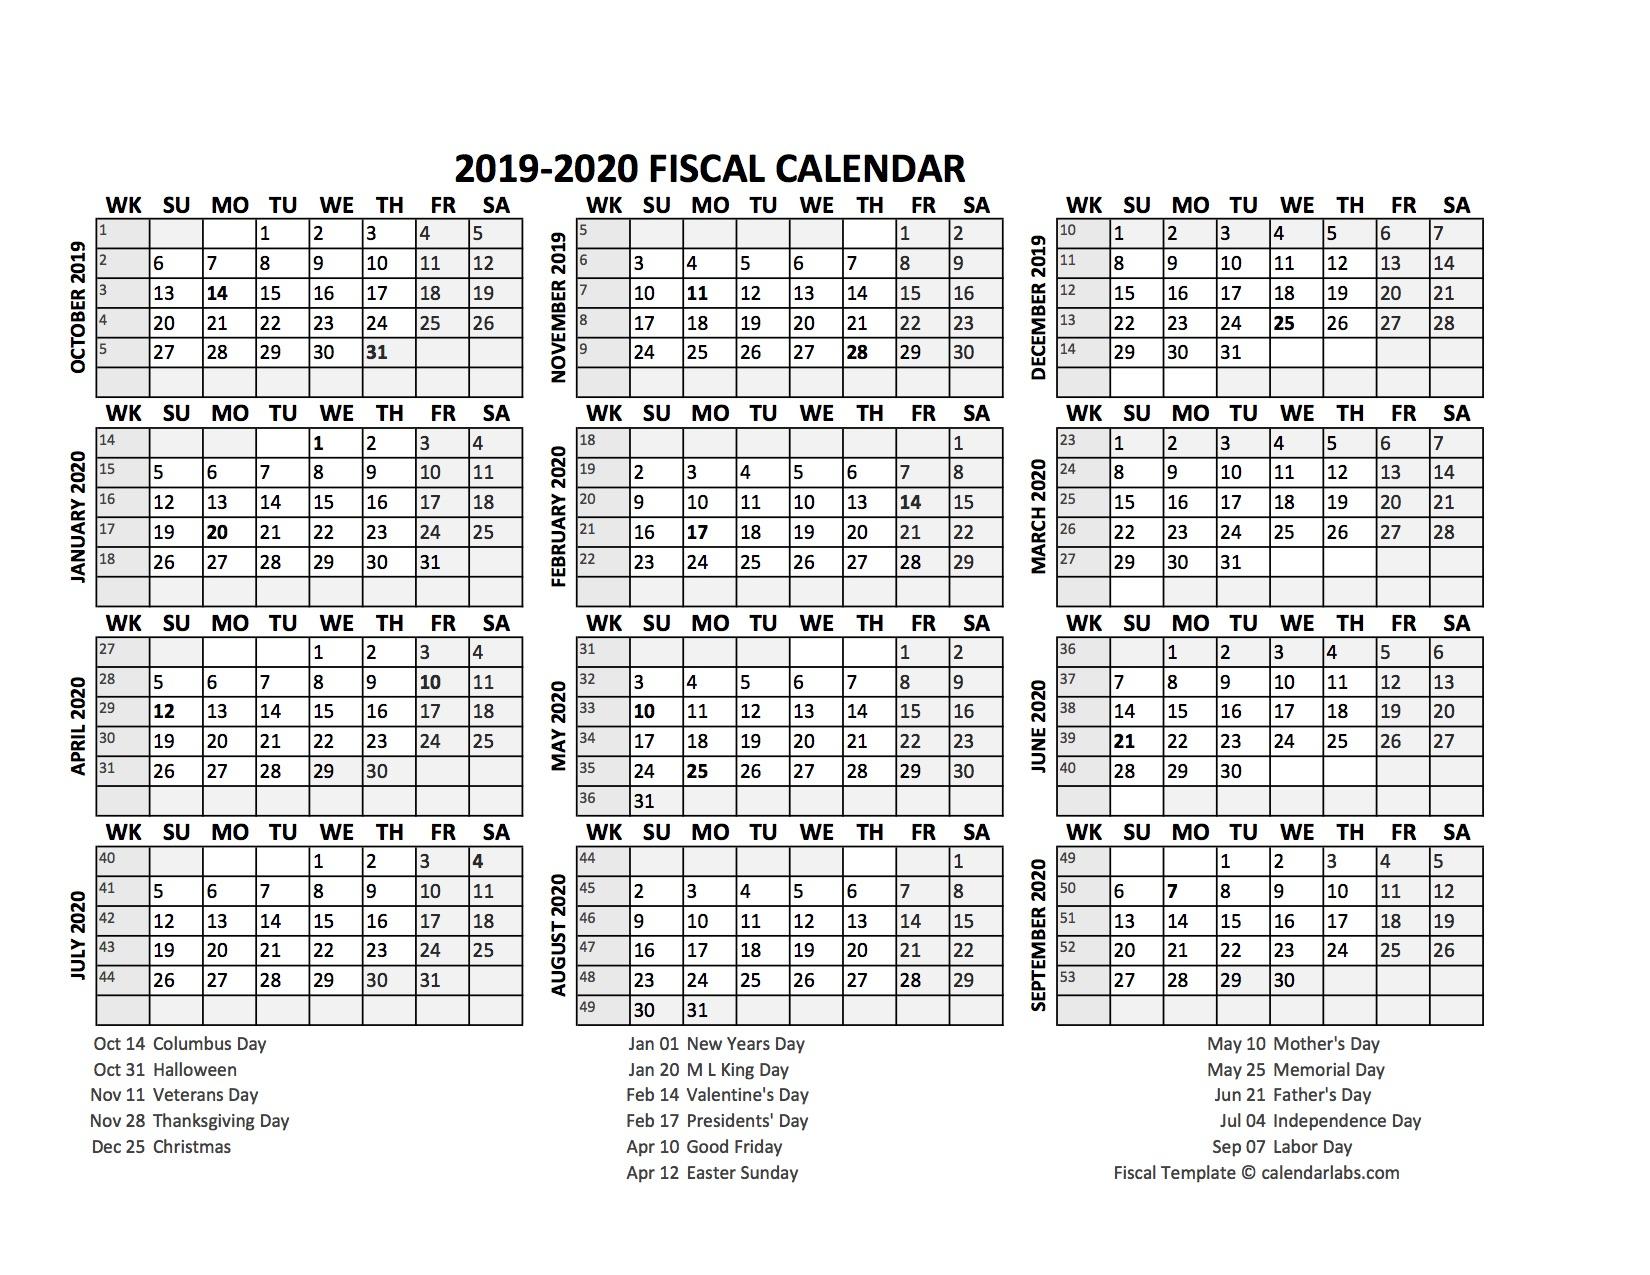 Fiscal Calendar 201920 Templates  Free Printable Templates with Financial Calendar 2021/21 Excel